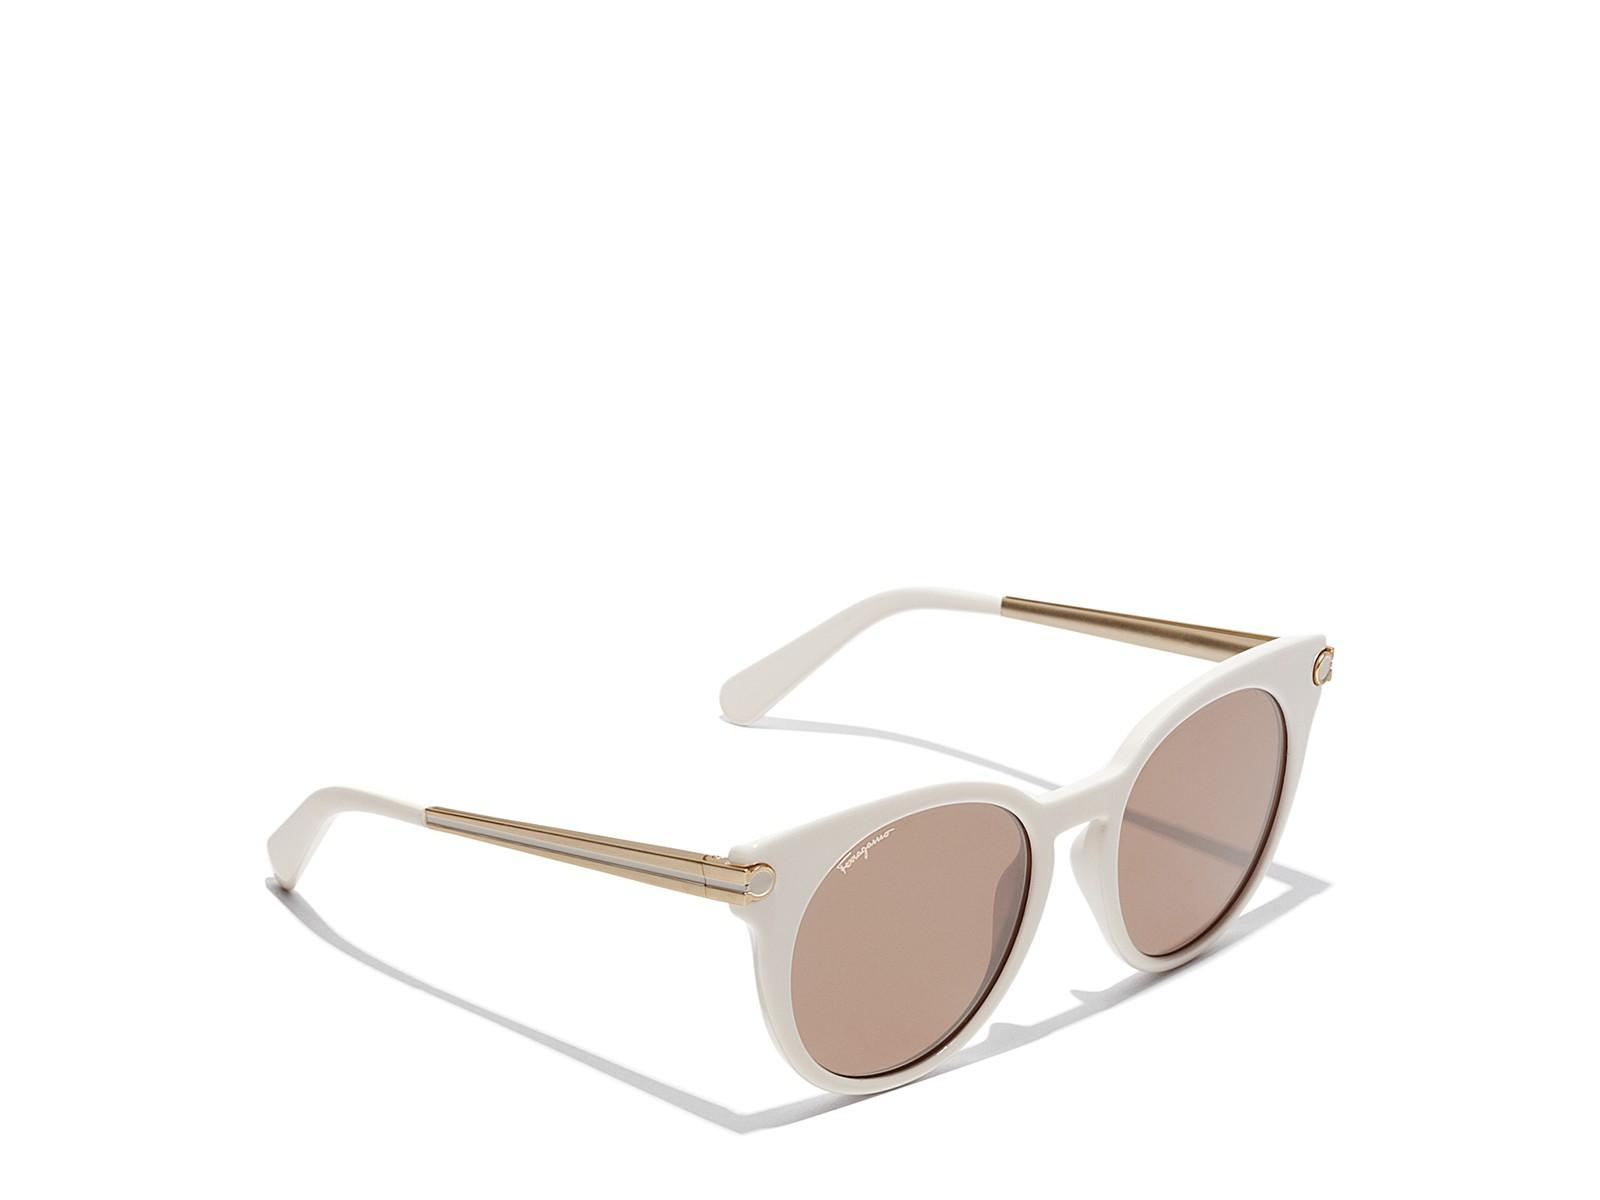 Salvatore Ferragamo Sunglasses In Ivory